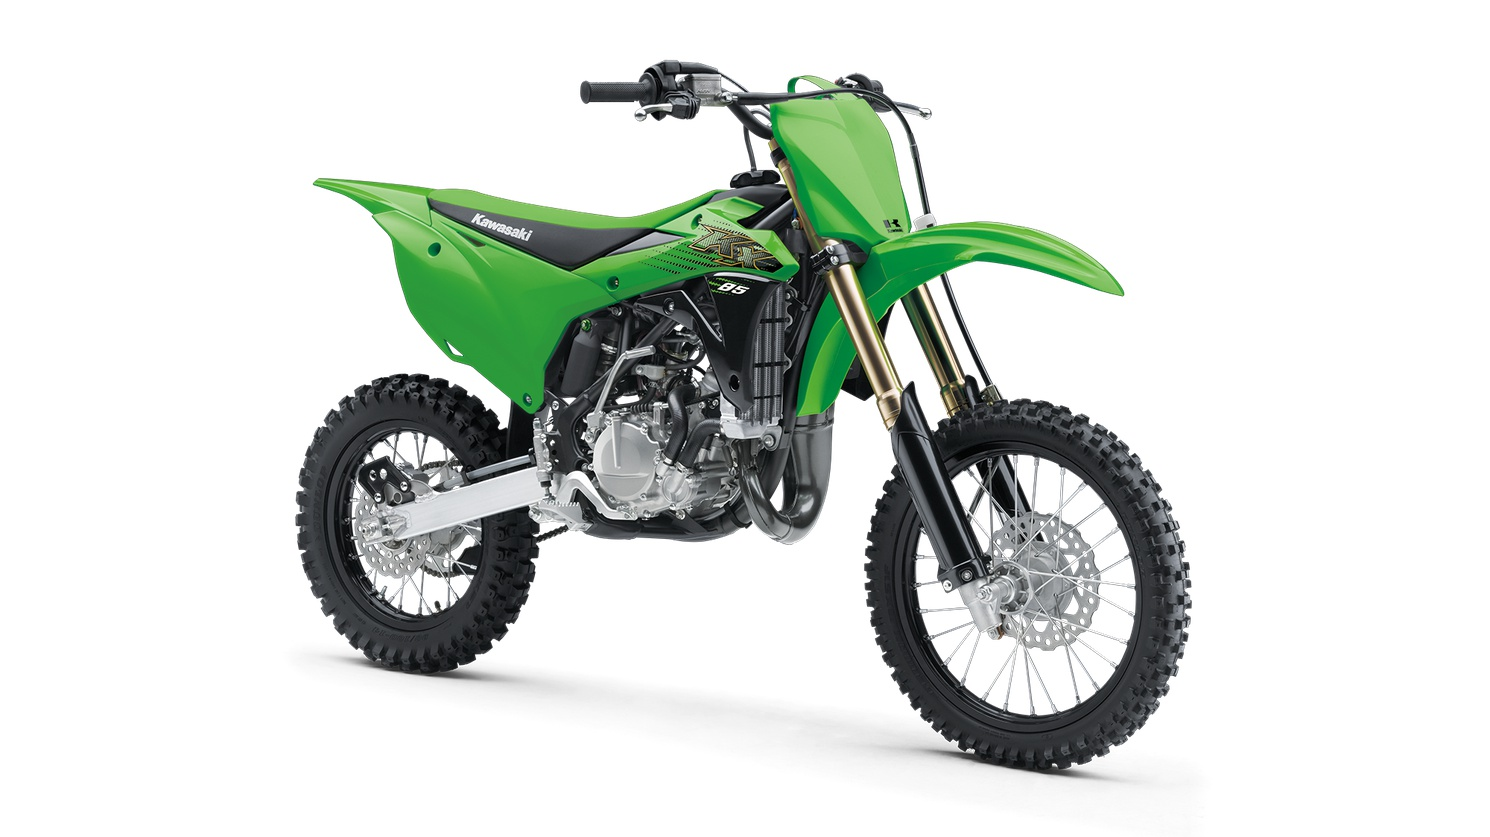 2020 Kawasaki KX85 Lime Green